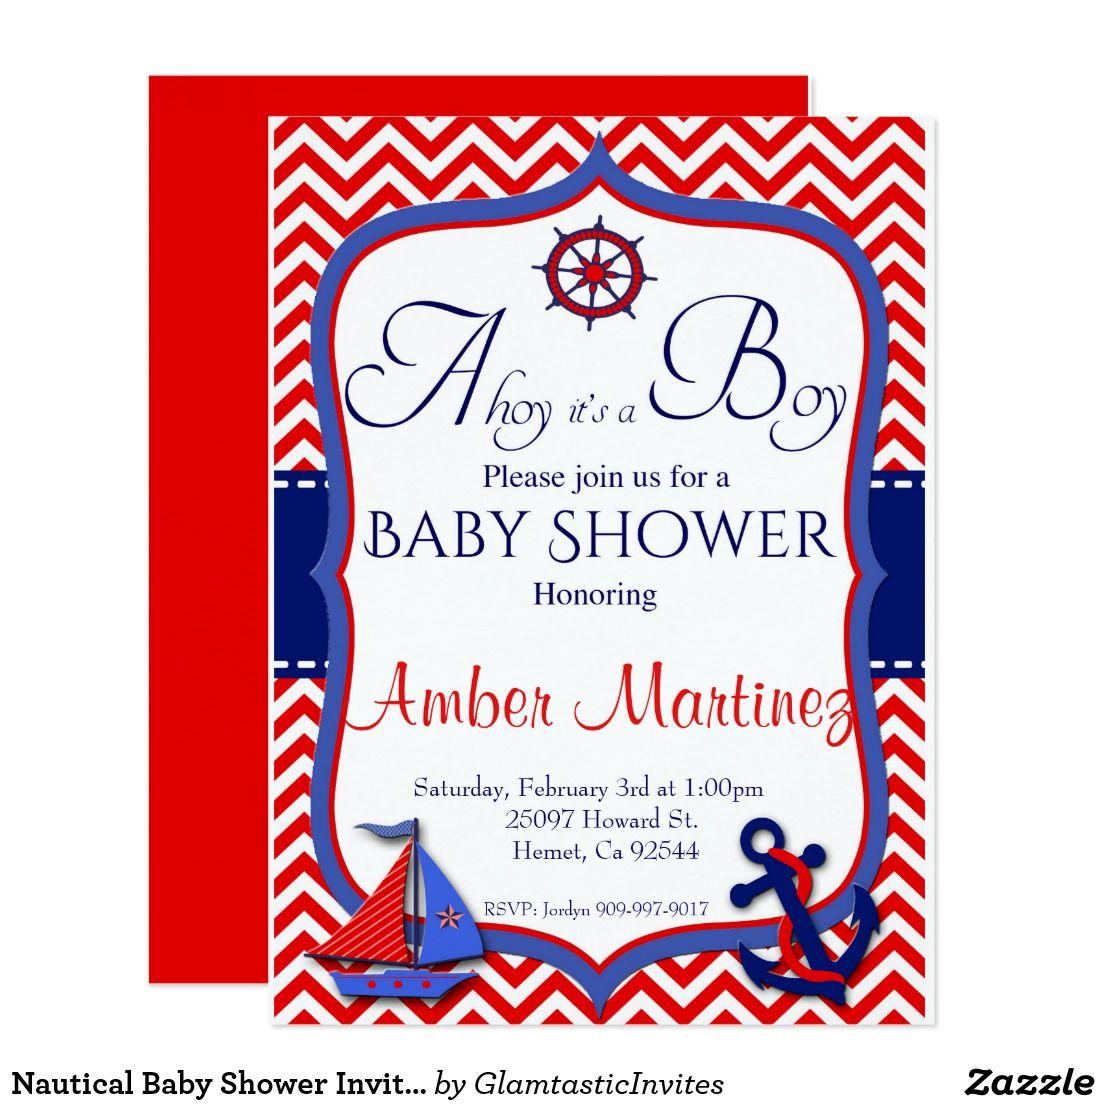 Nautical baby shower invitation ahoy its a boy c card zazzle nautical baby shower invitation ahoy its a boy c card zazzle filmwisefo